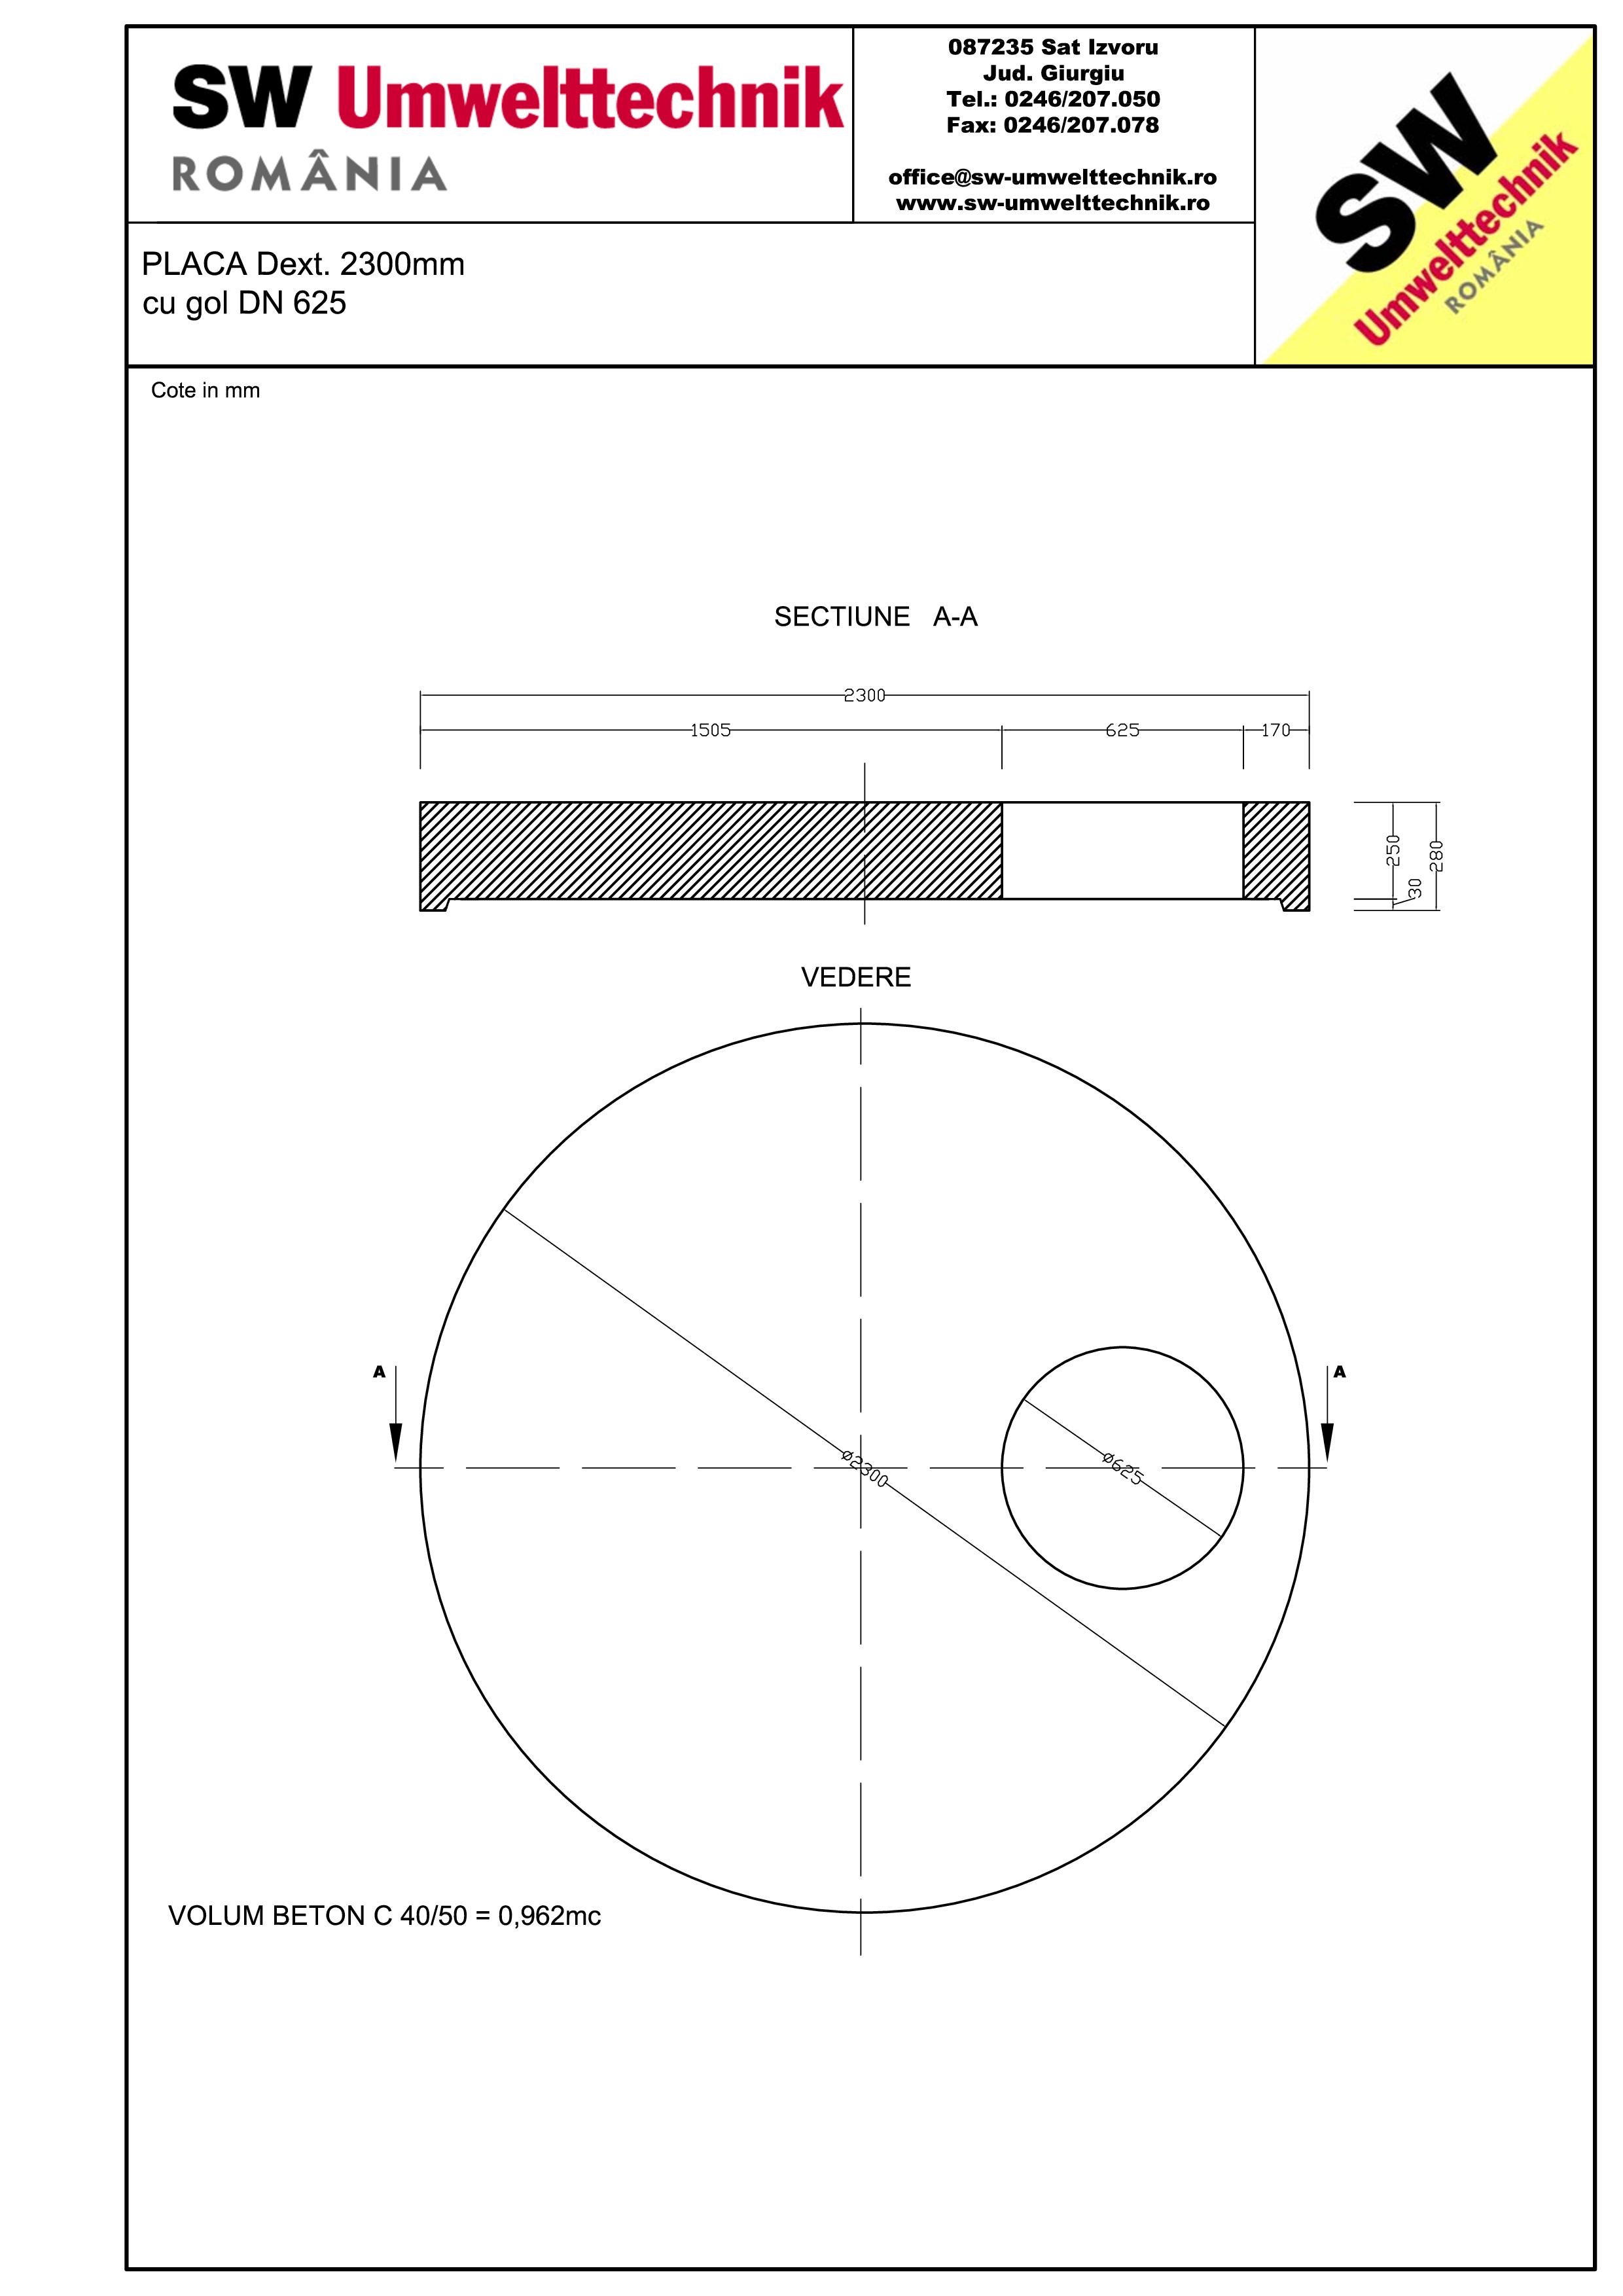 Pagina 1 - CAD-PDF Placa Dext.2300 H250 cu gol DN625 SW UMWELTTECHNIK Detaliu de produs